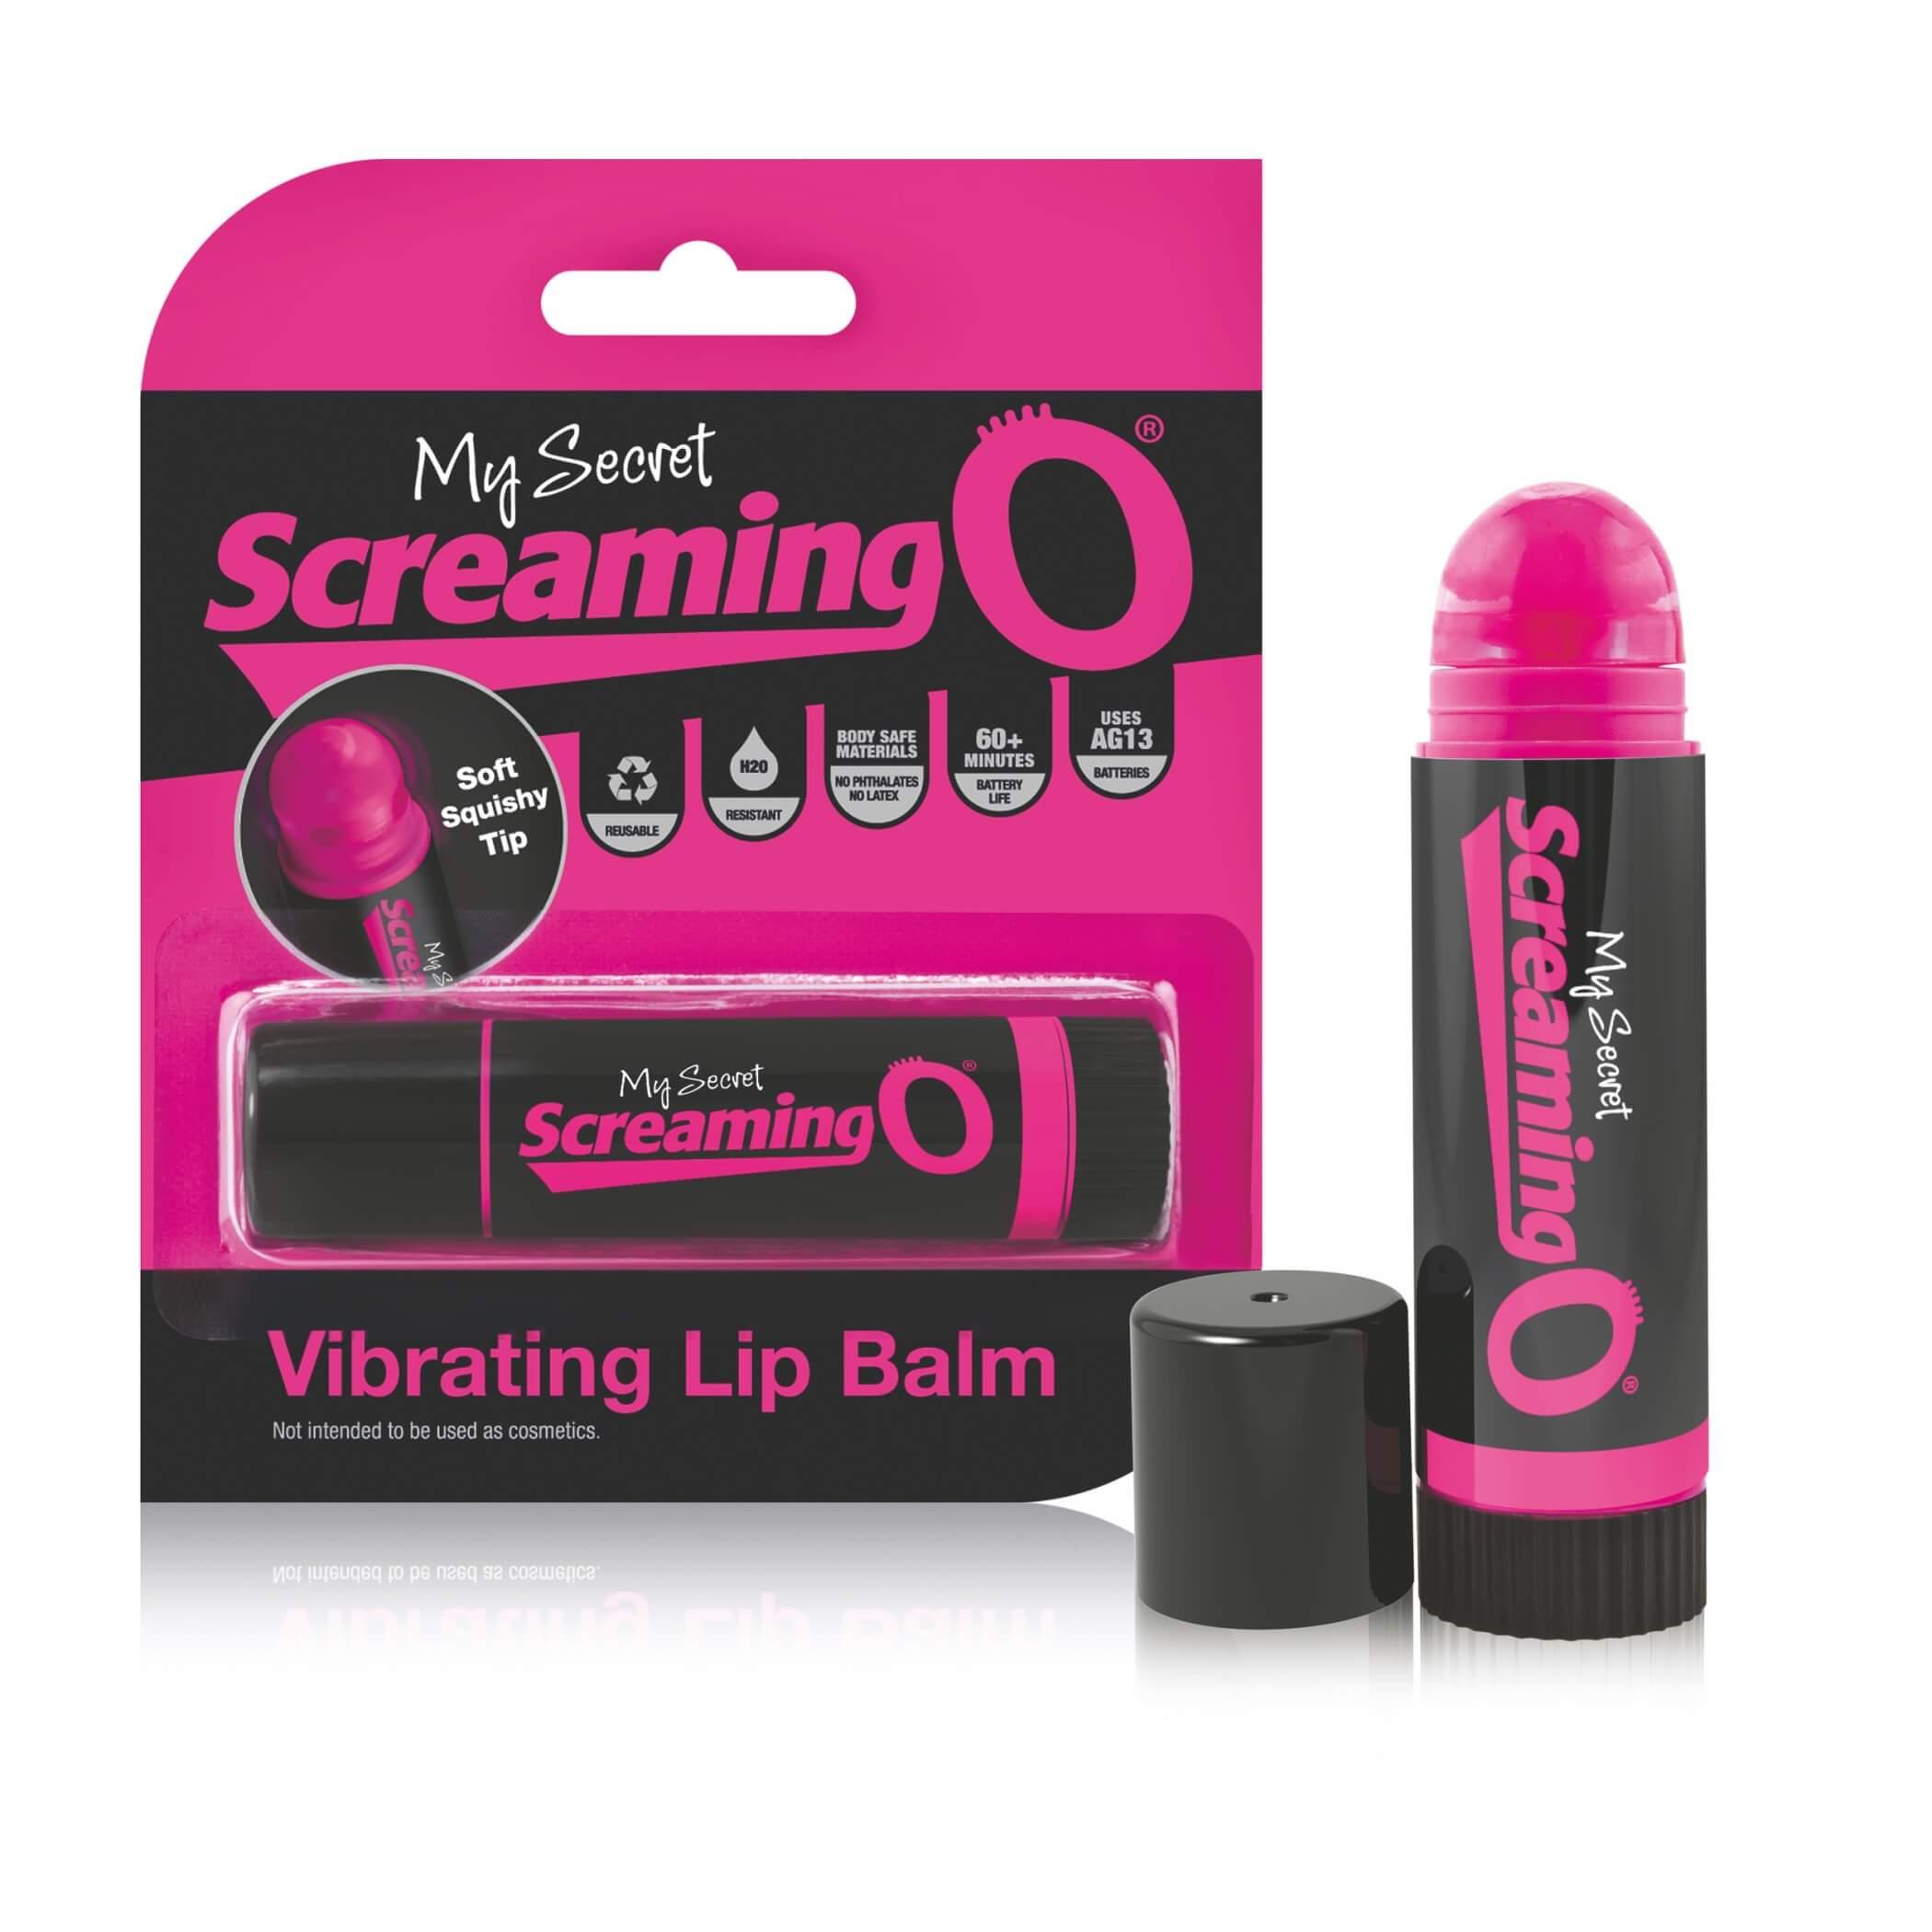 My Secret Screaming O Vibrating Lip Balm – vibrátor v tvare rúžu (pink-čierny)